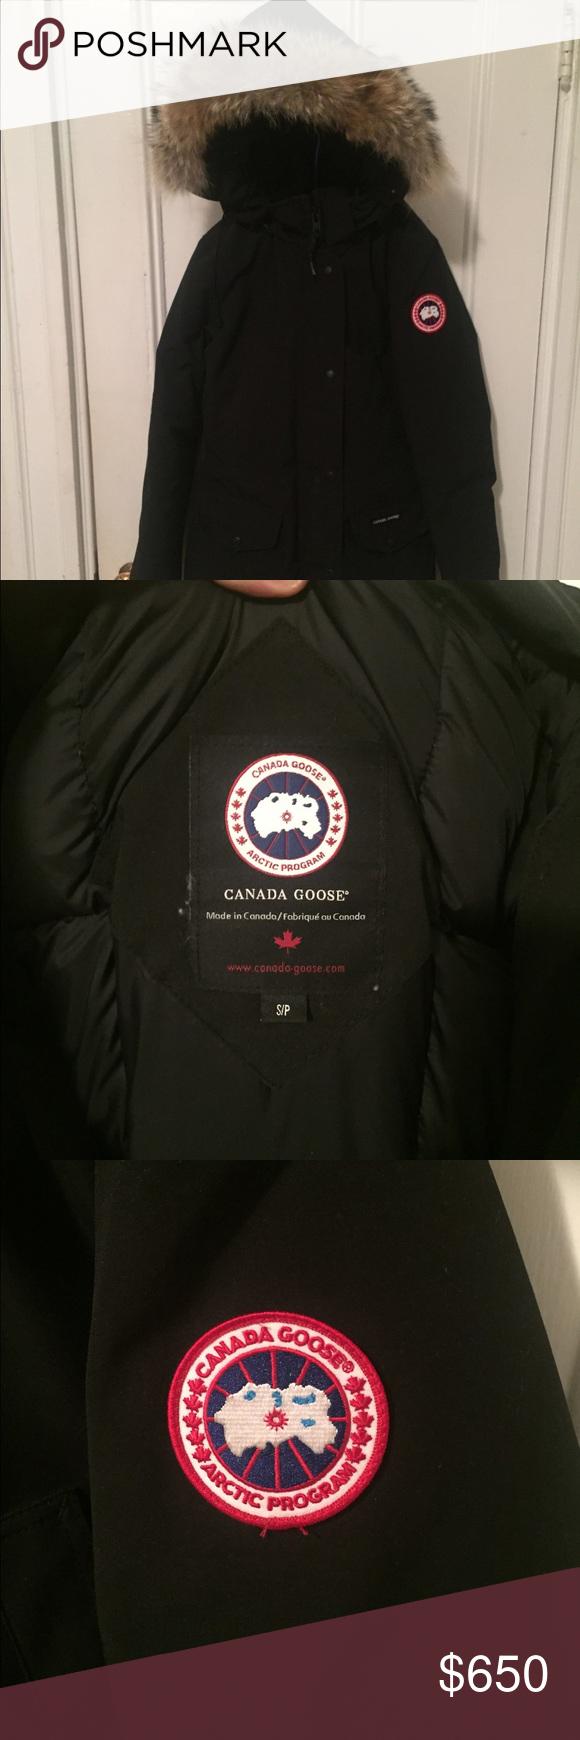 canada goose jackets good